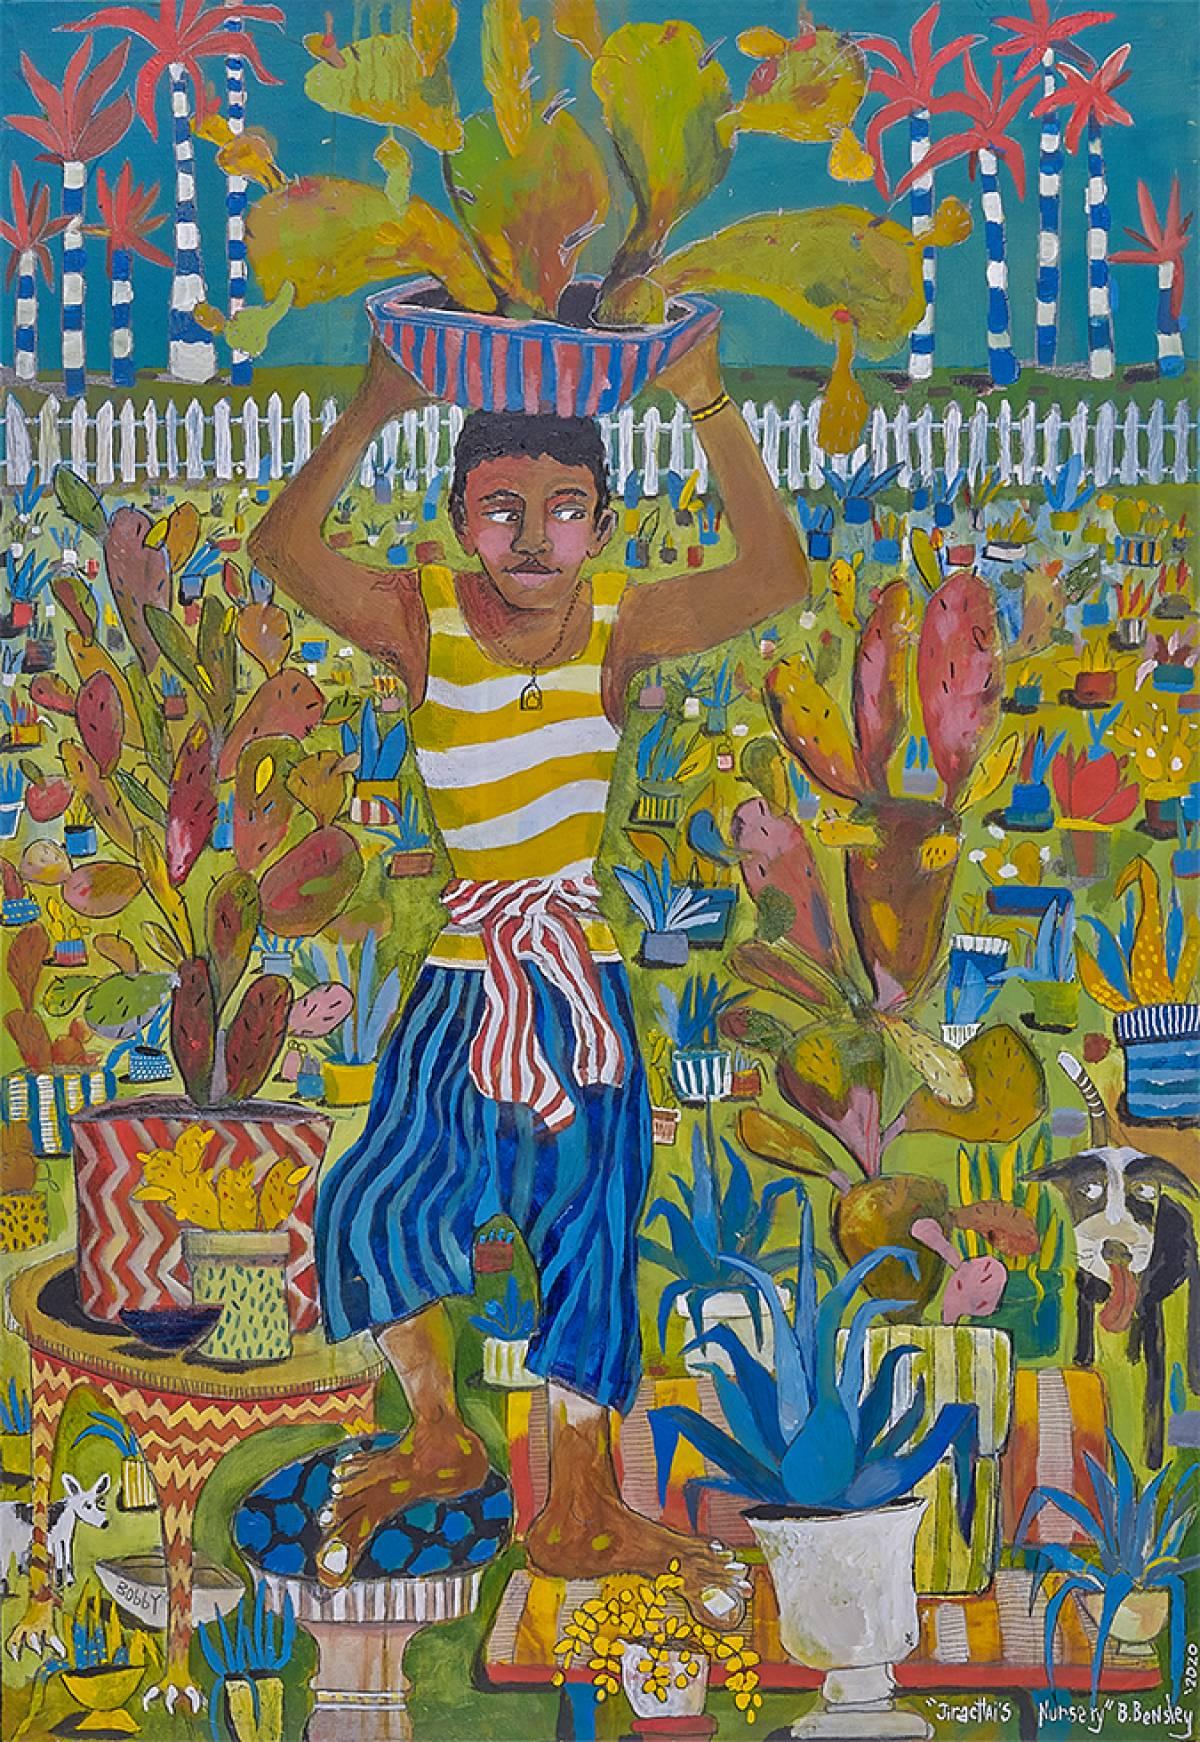 Bill Bensley - Artist and Exhibitionist